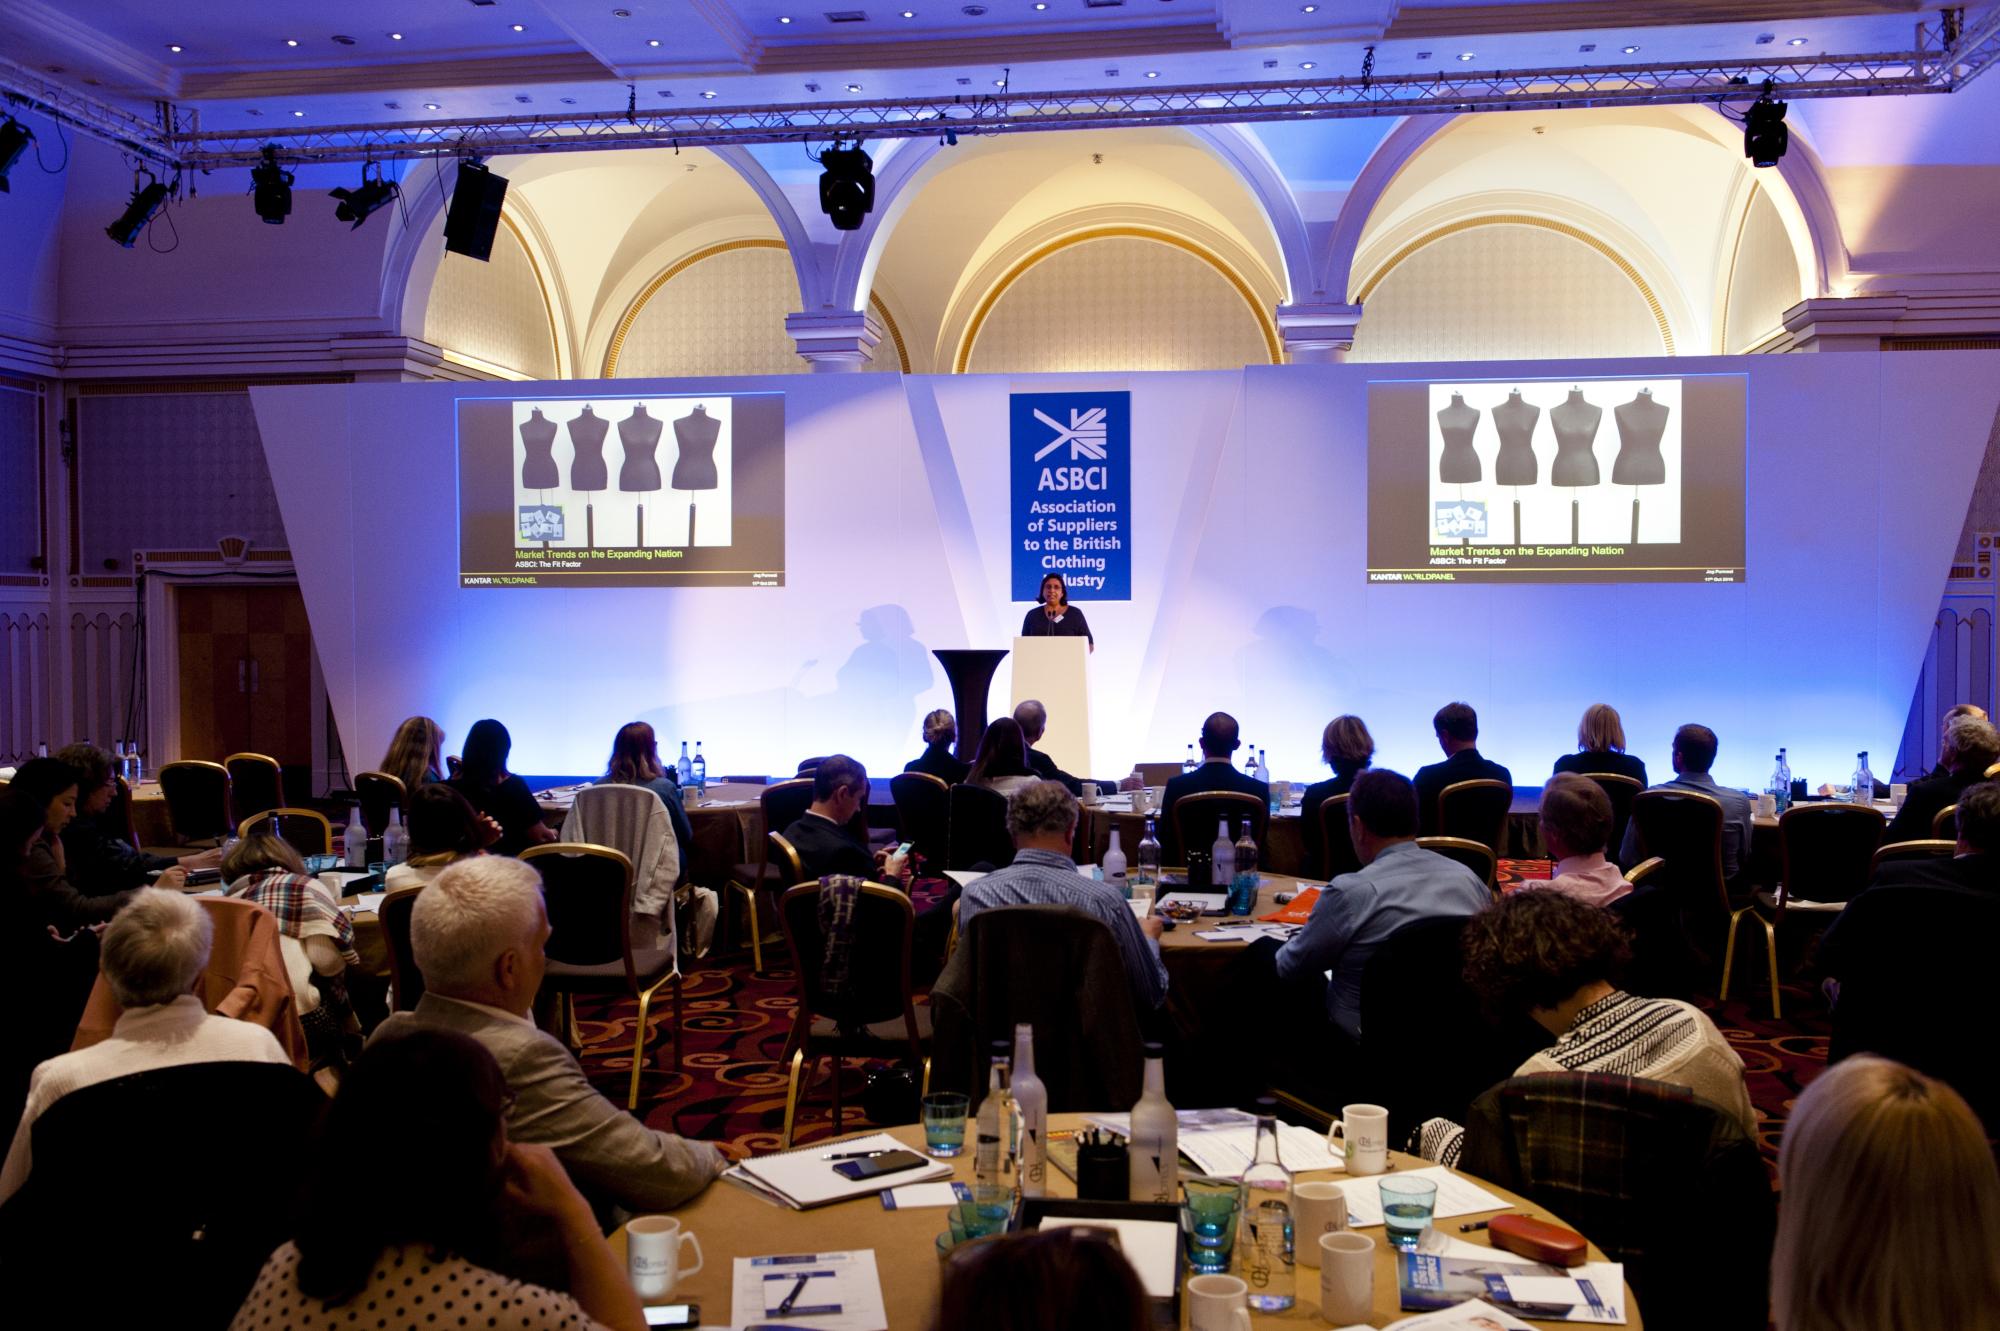 ASBCI, Peterborough, sostenibilidad, Responsabilidad Social Corporativa, Marks & Spencer, TÜV Rheinland, Halifax, Conferencia anual de la ASBCI,